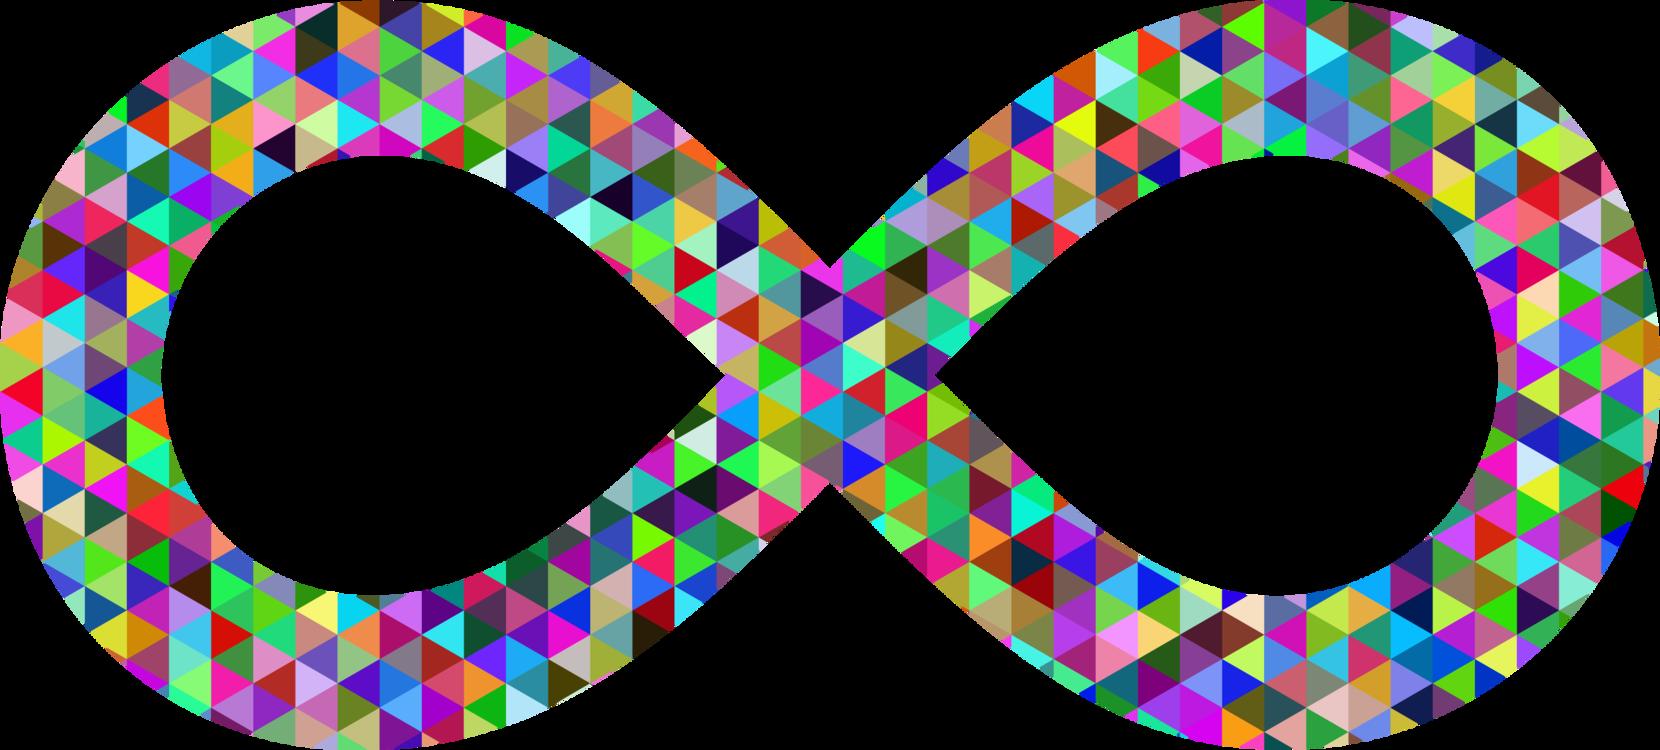 Line,Circle,Infinity Symbol